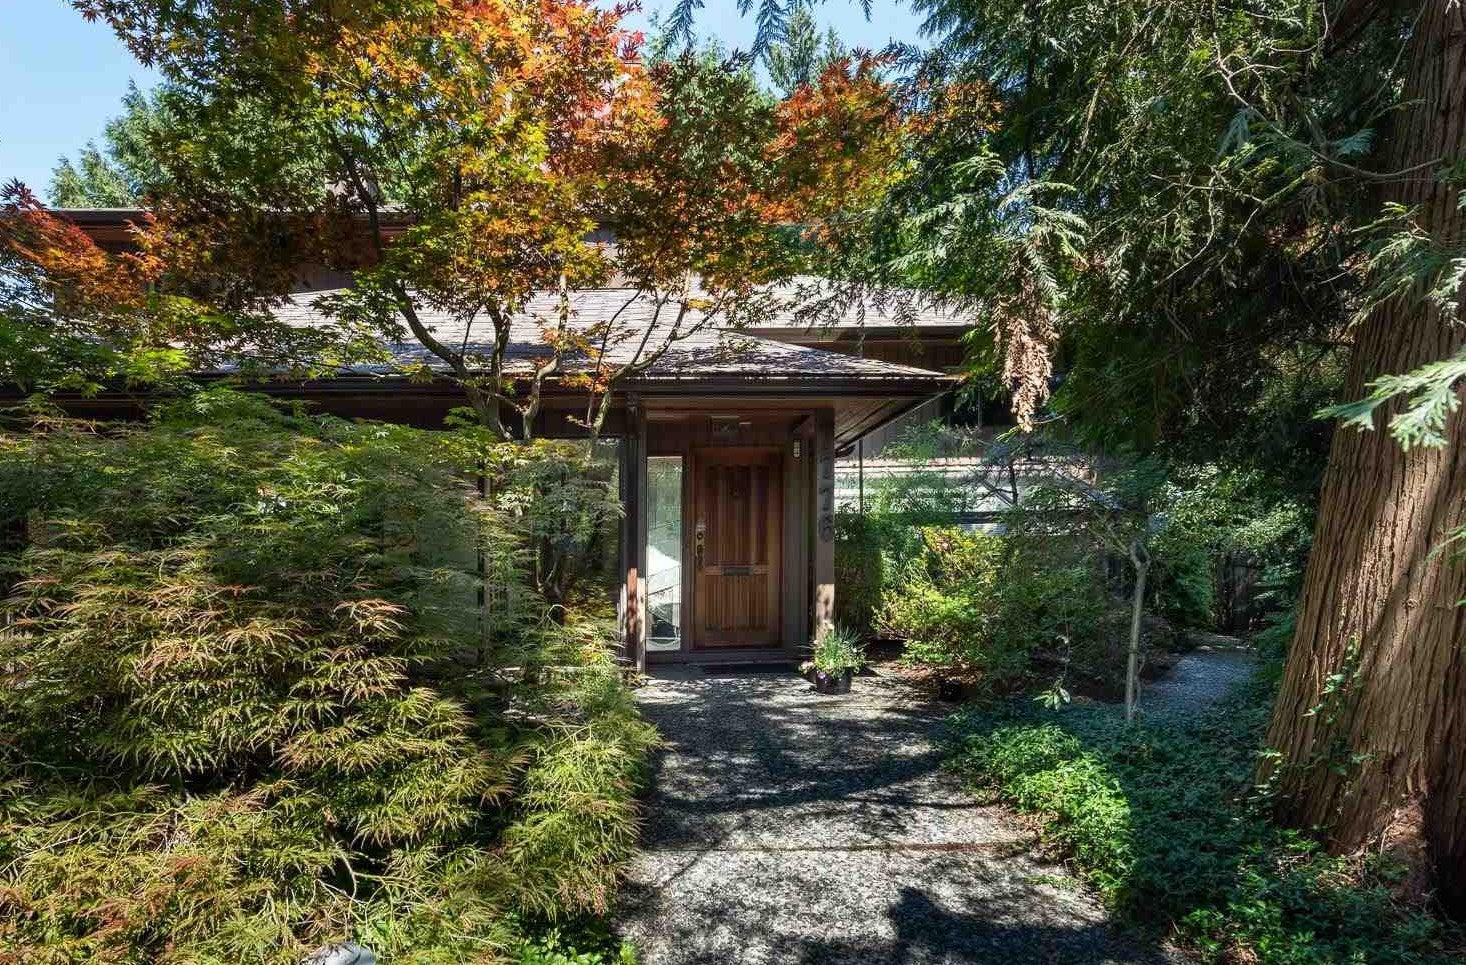 7776 KAYMAR DRIVE - Suncrest House/Single Family for sale, 4 Bedrooms (R2599750) - #1